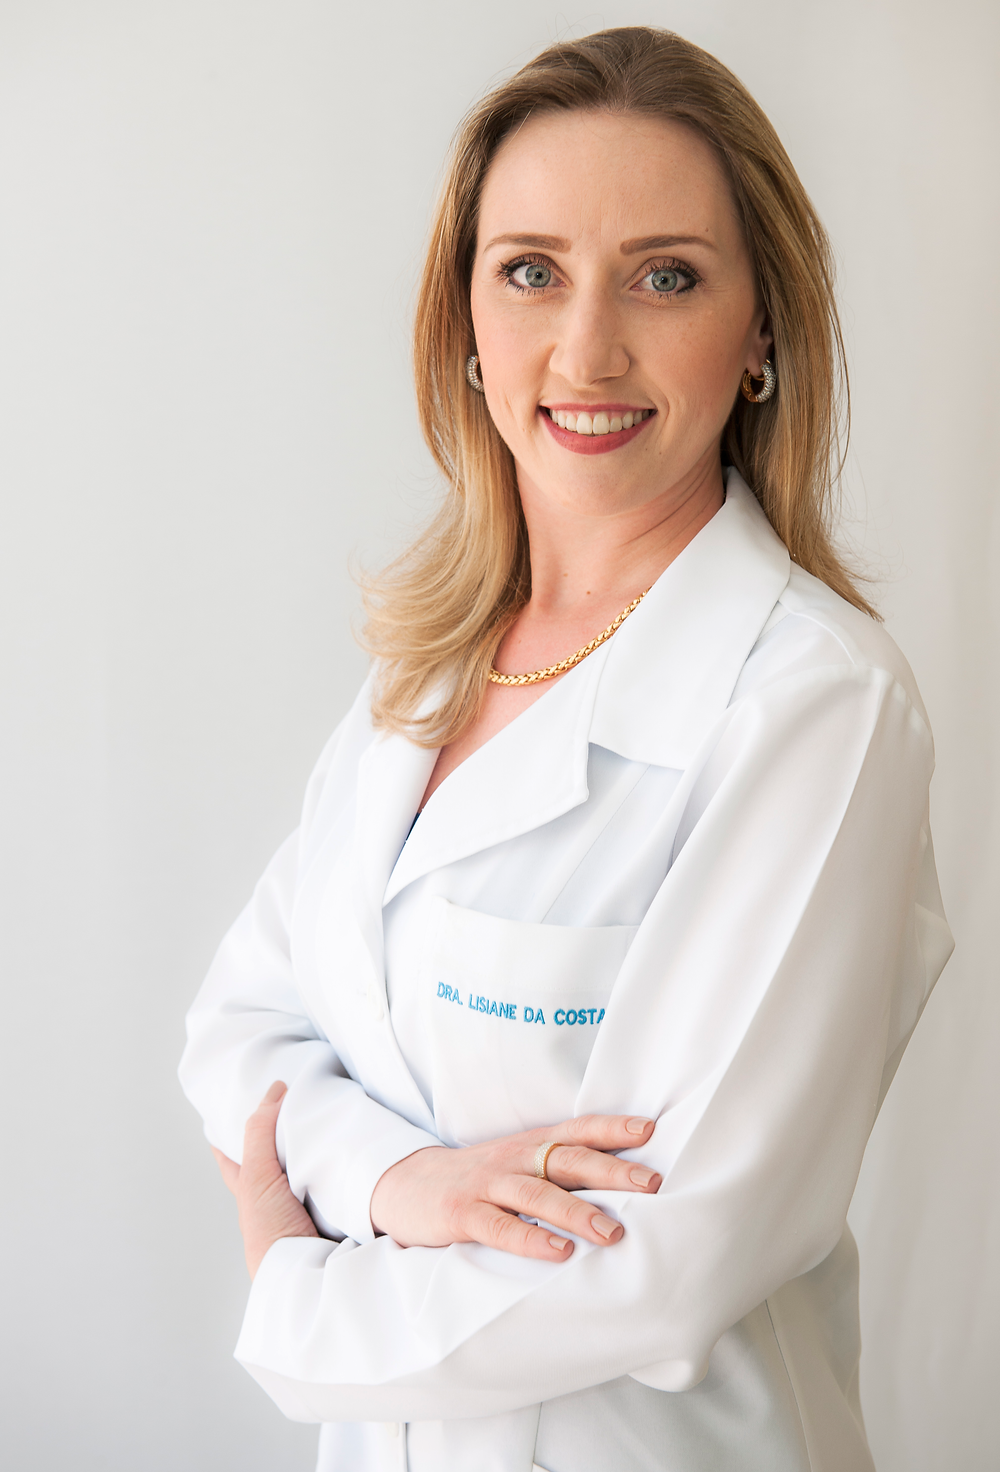 Dra. Lisiane Knob da Costa - Ginecologista